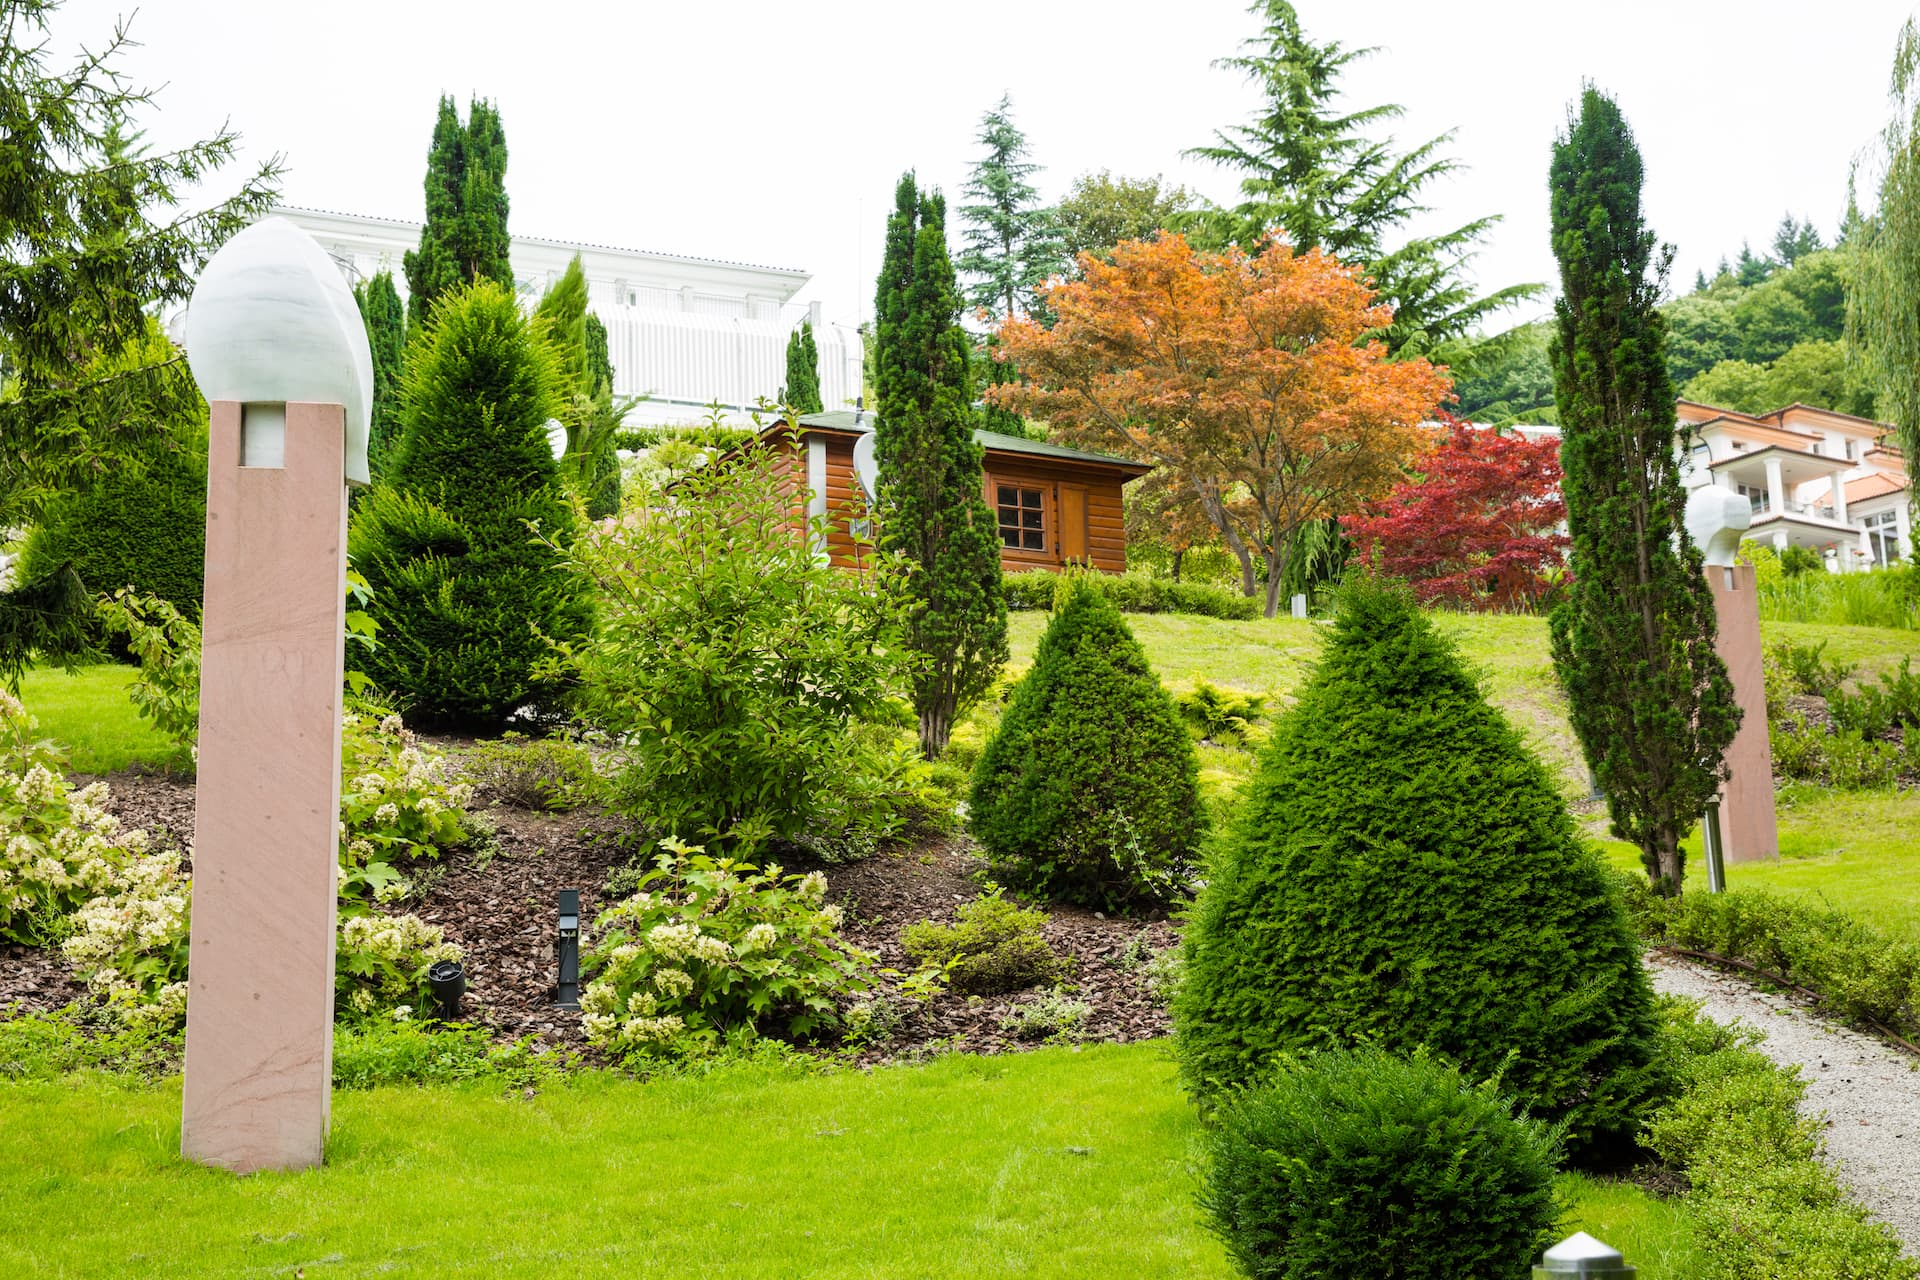 Exklusiver Hausgarten in Hanglage